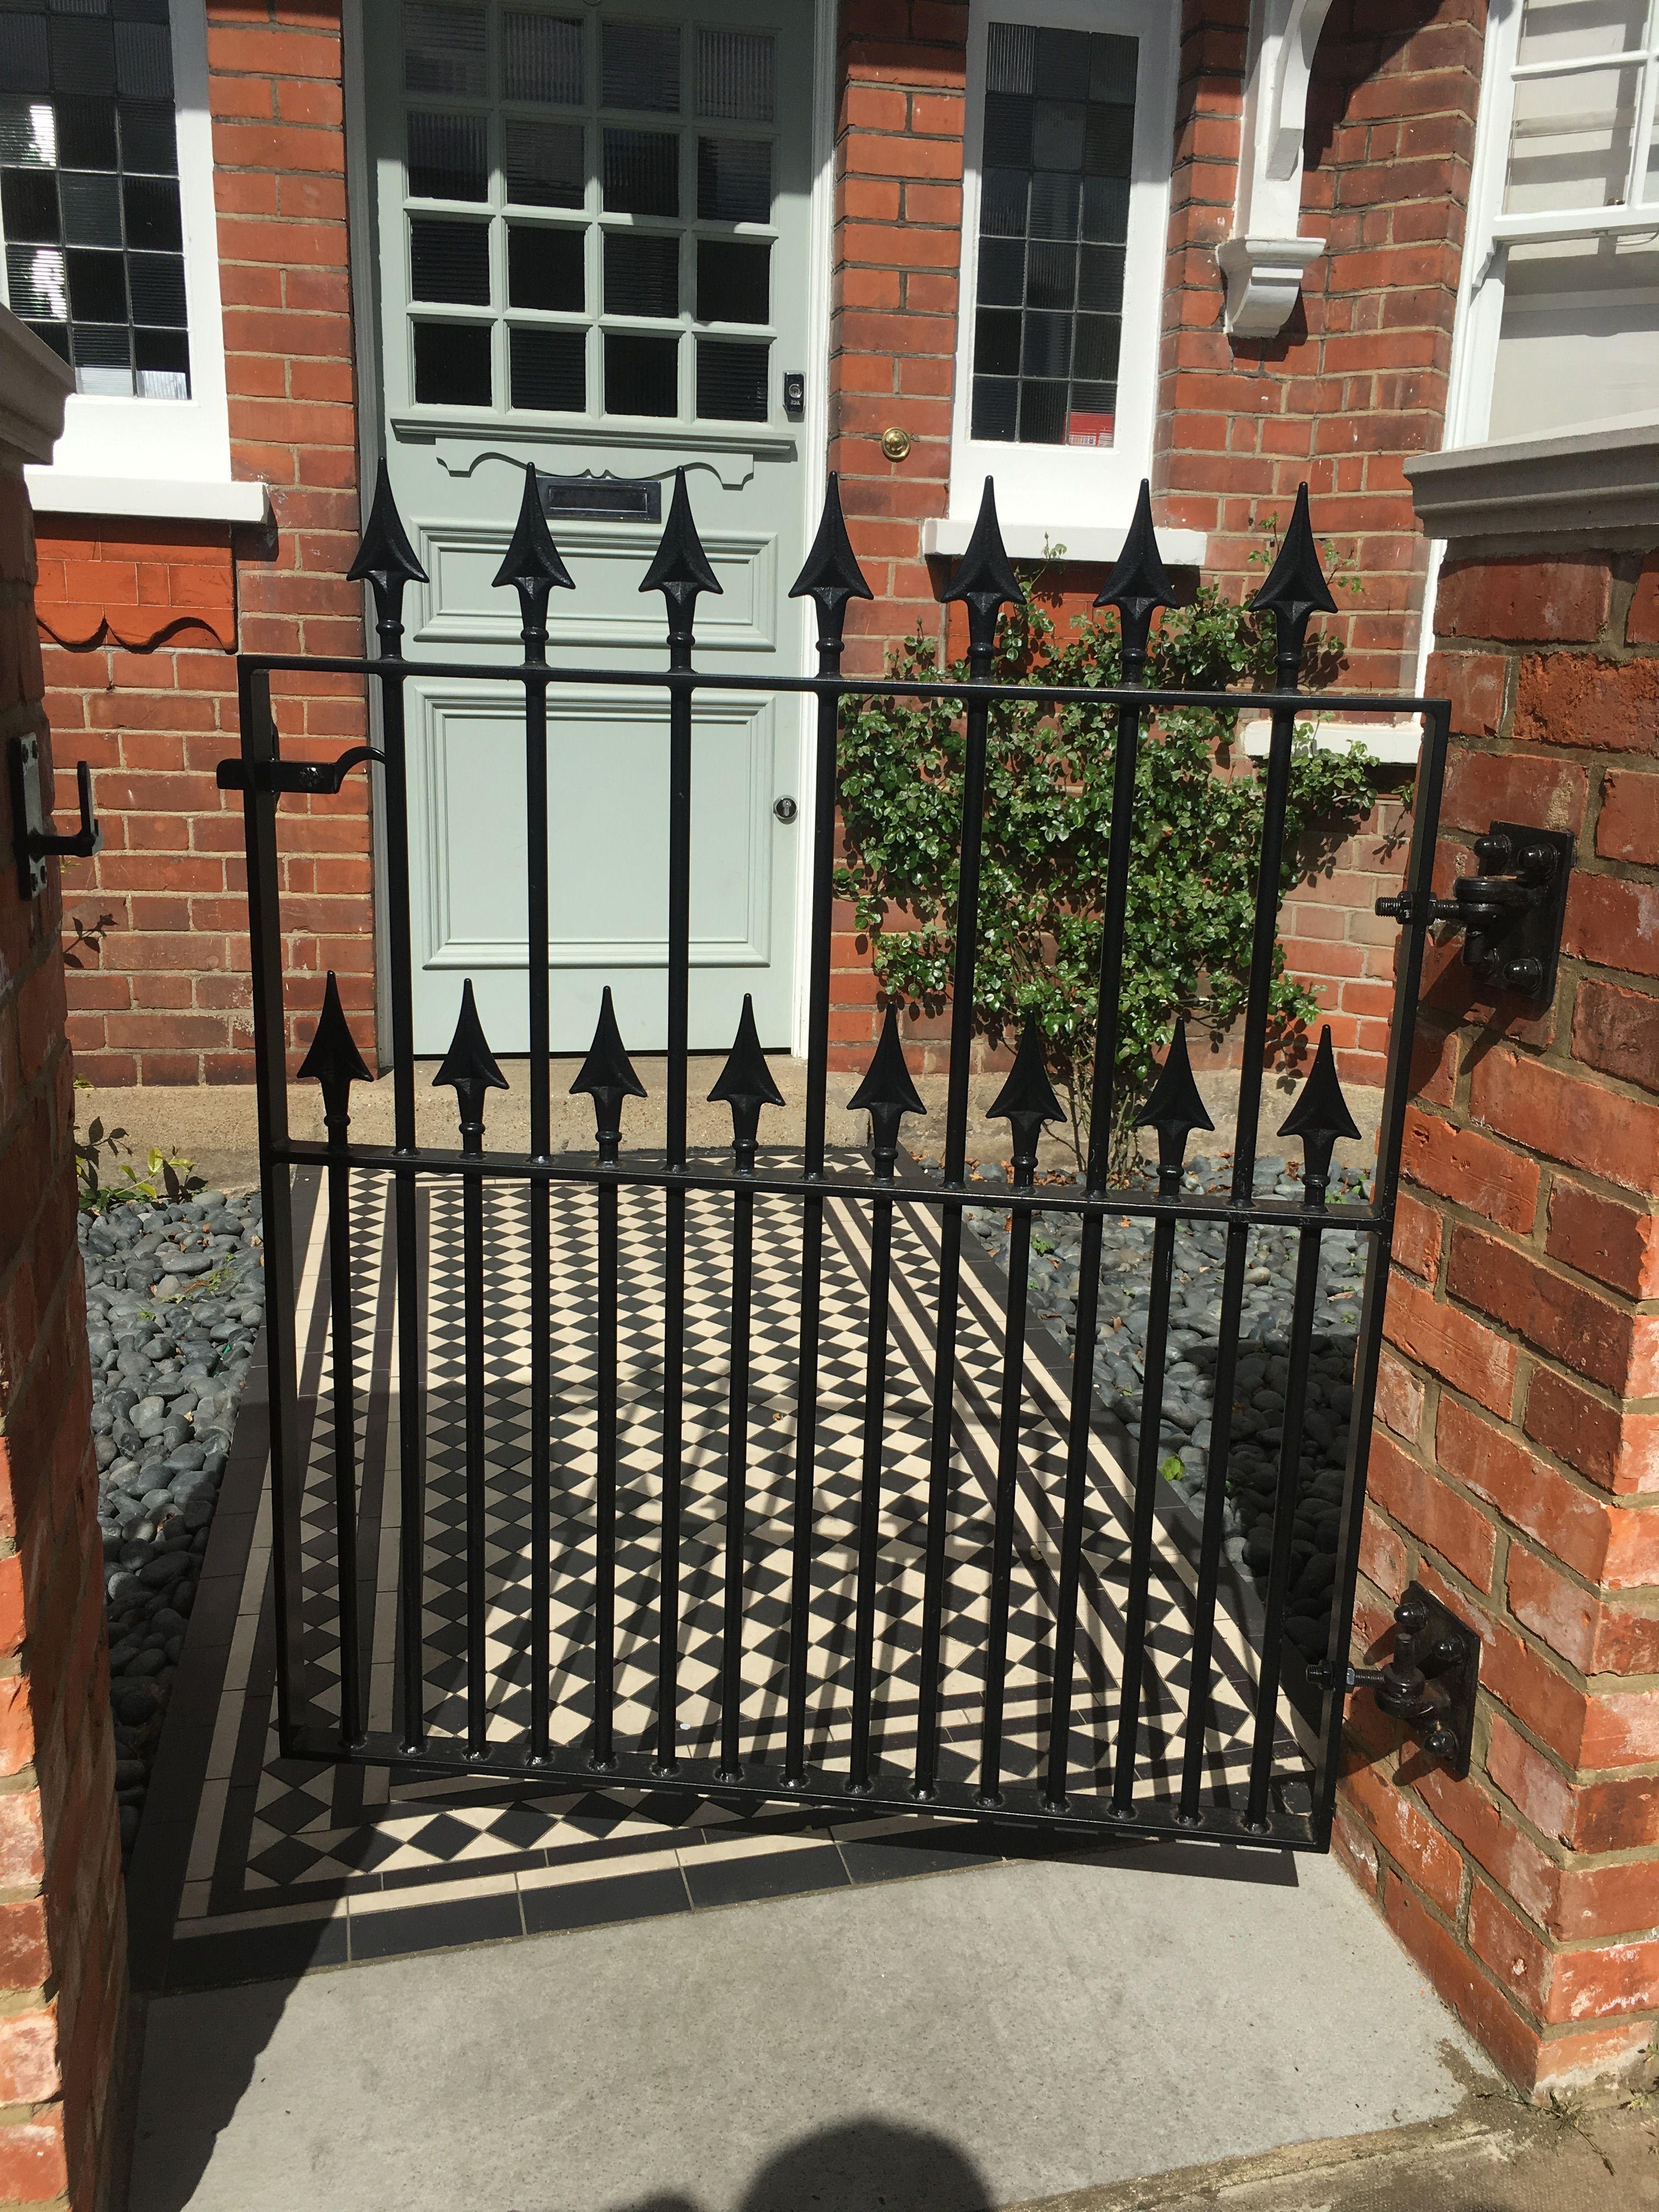 West London Edwardian House Front Garden Pretty Black Wrought